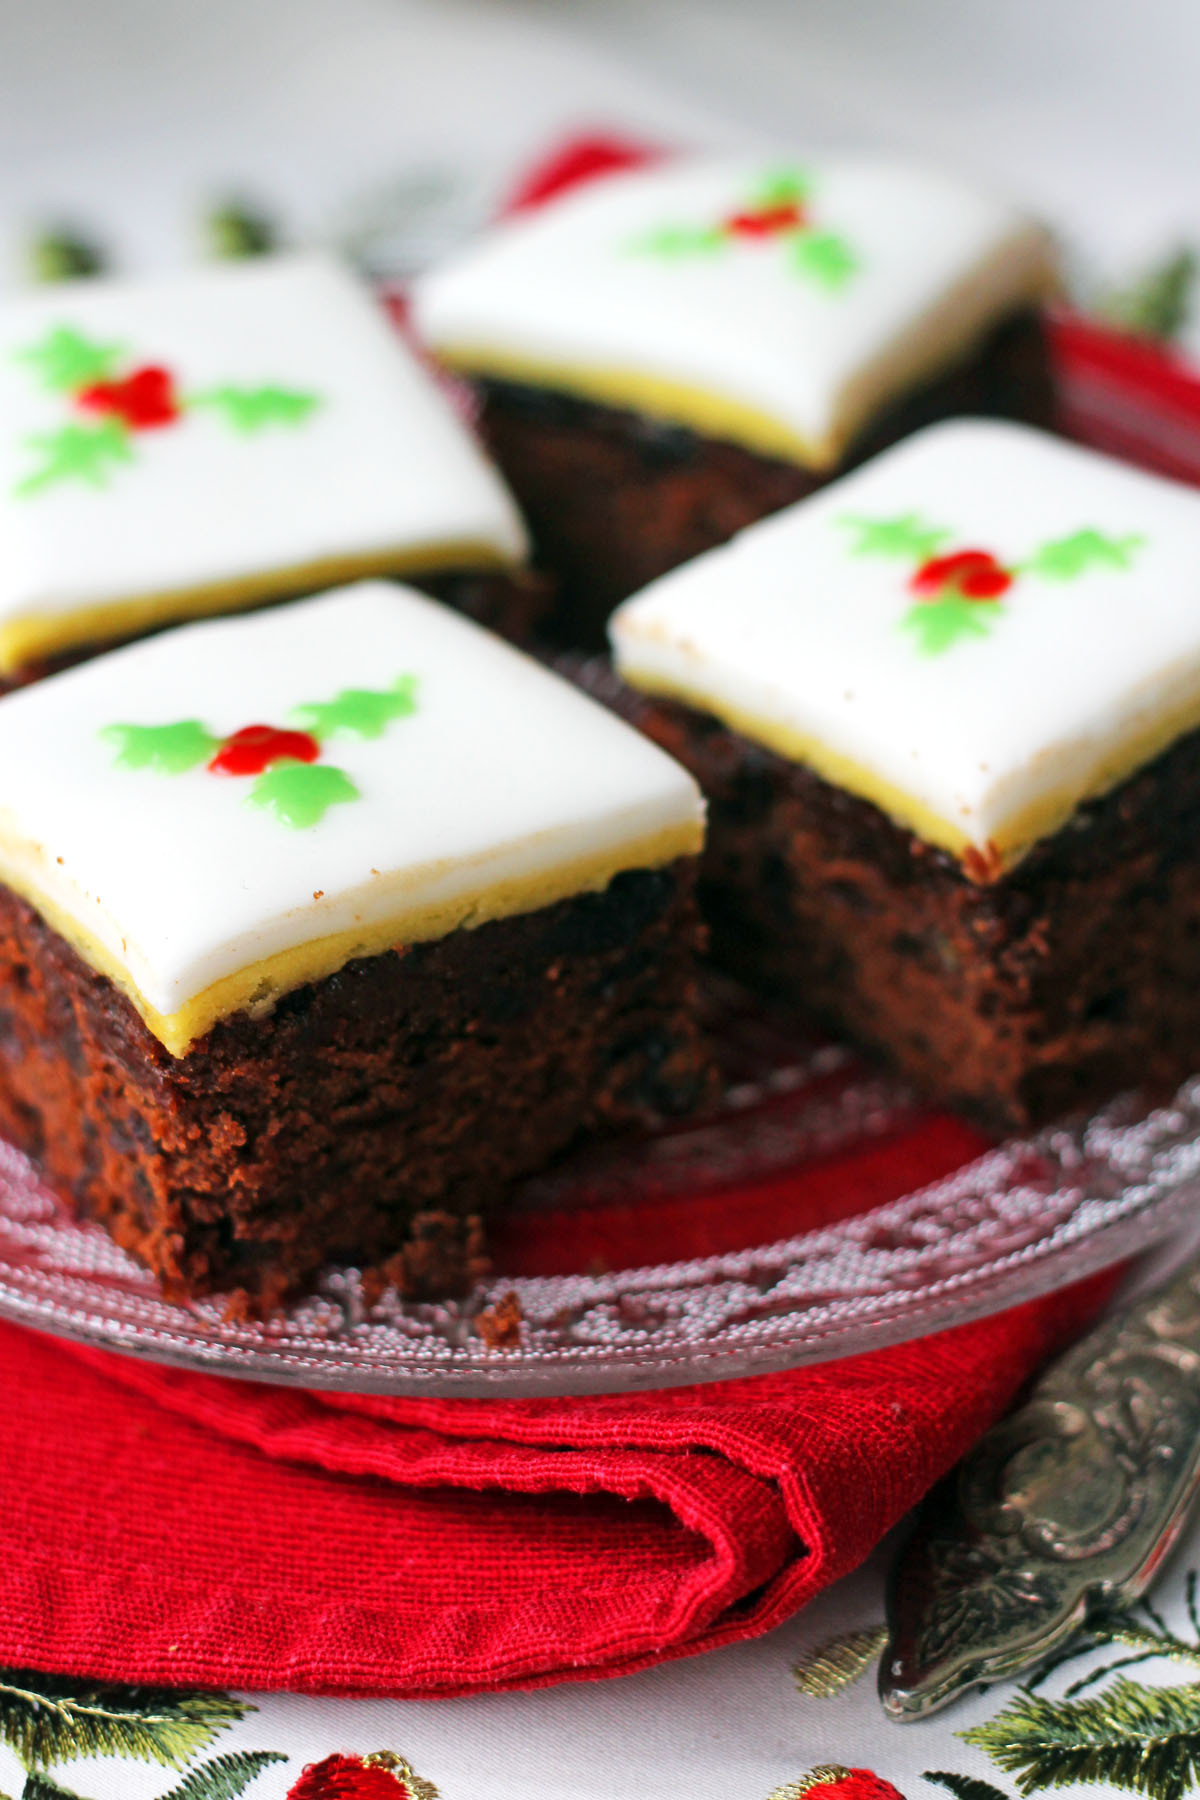 Recipes For Christmas Cakes  Christmas Chocolate and Orange Fruitcake